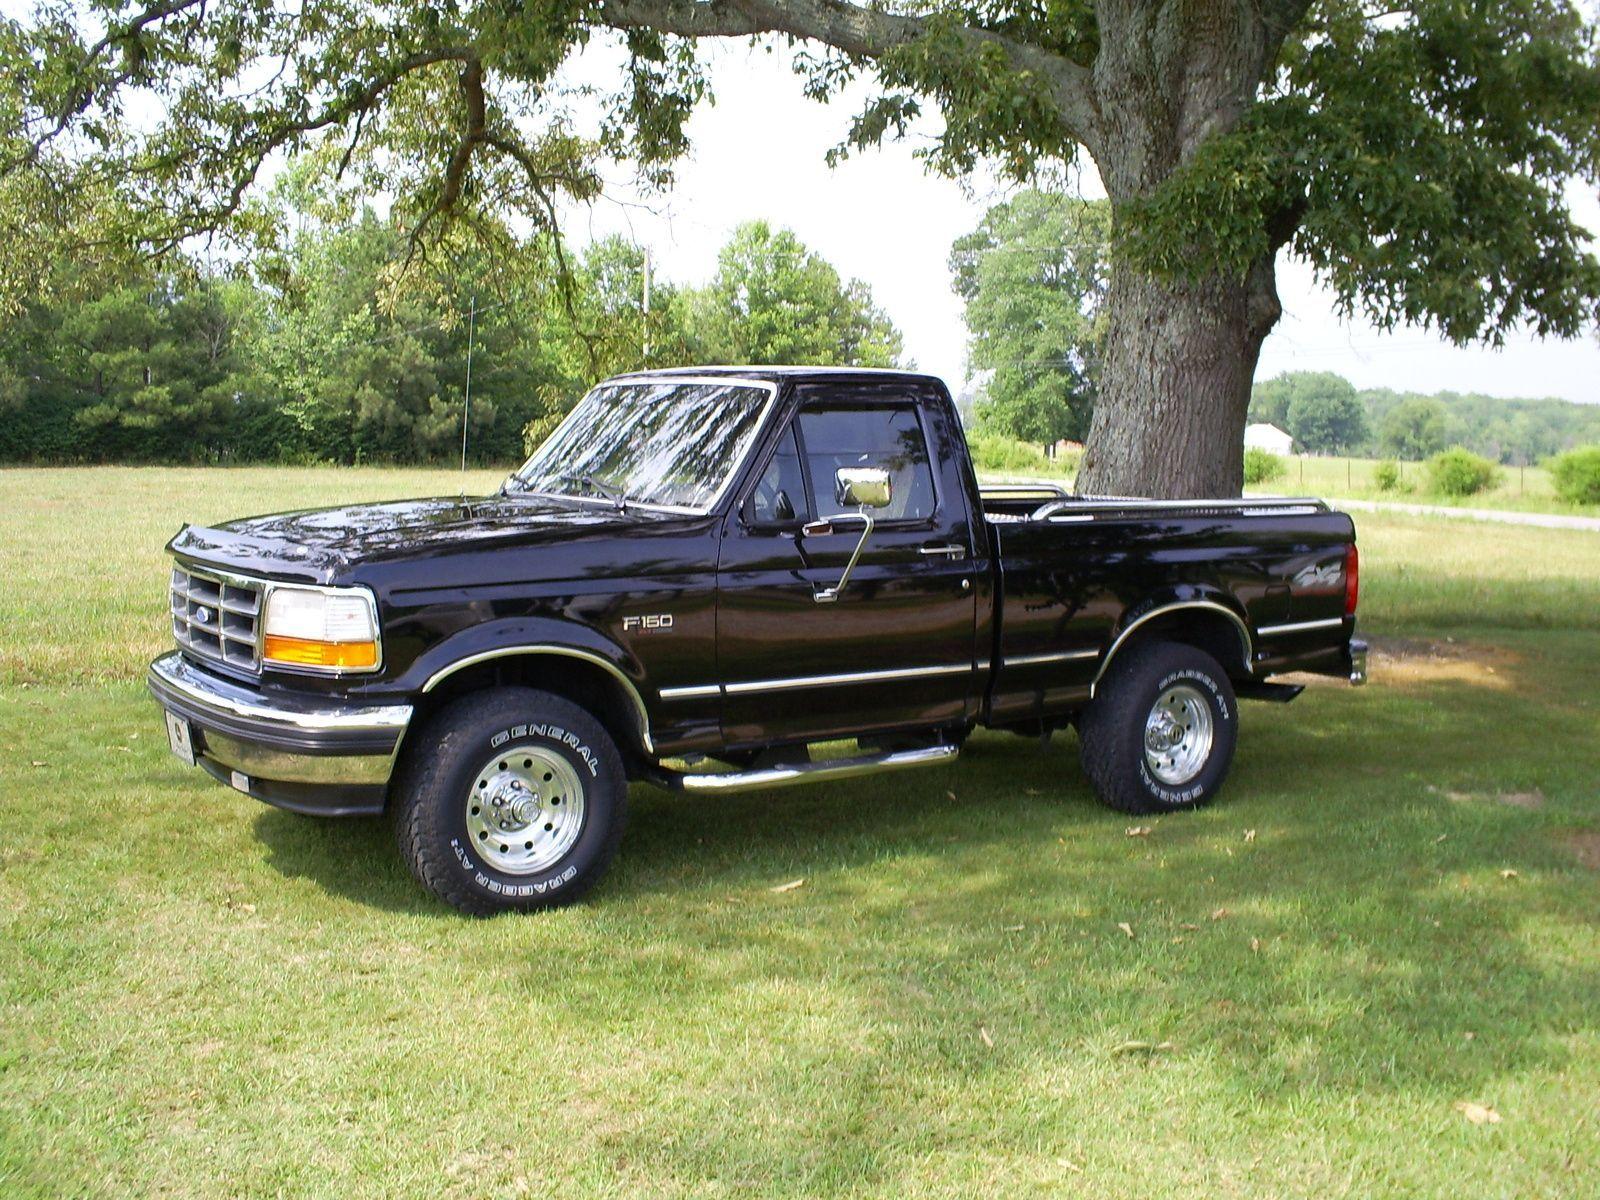 1995 Ford F 150 Regular Cab Short Bed Ford Pickup Trucks 1995 Ford F150 Classic Ford Trucks